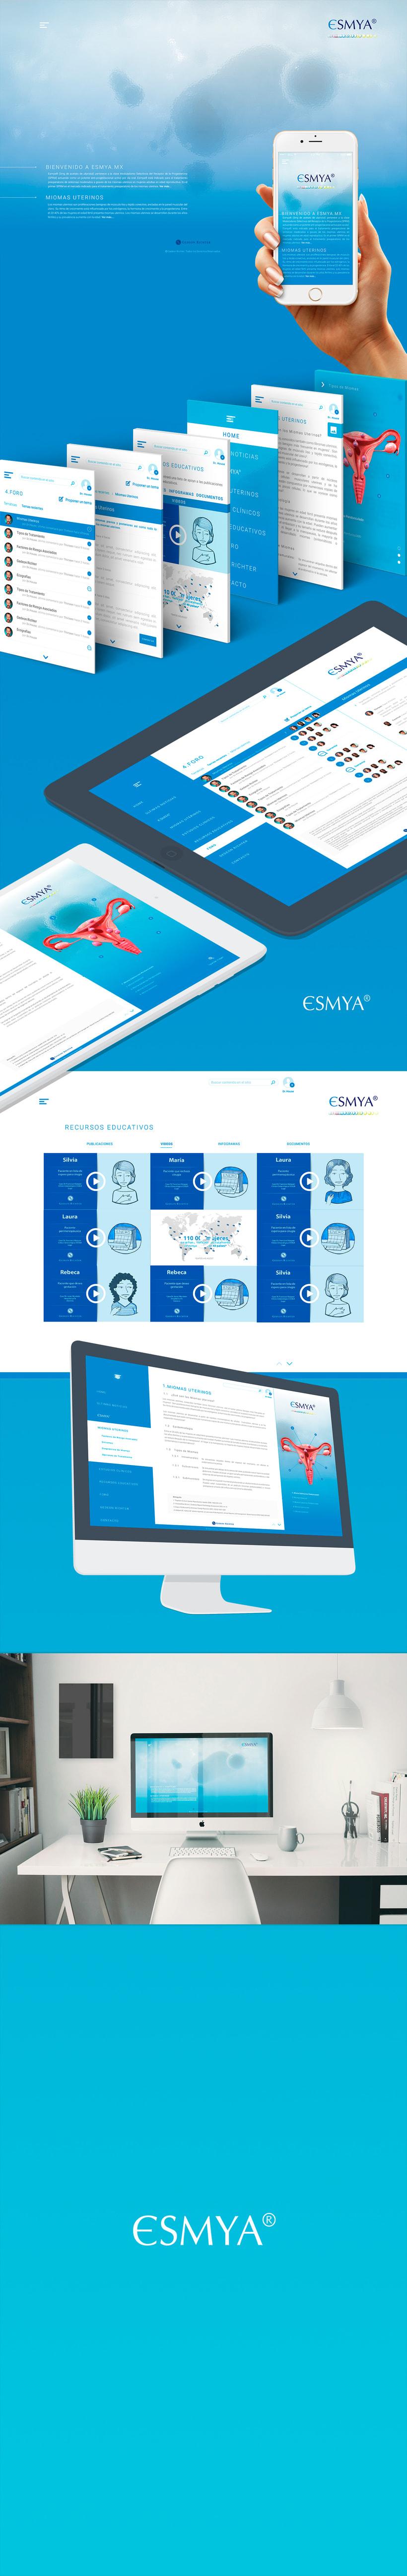 ESMYA® / Web Site Responsive -1